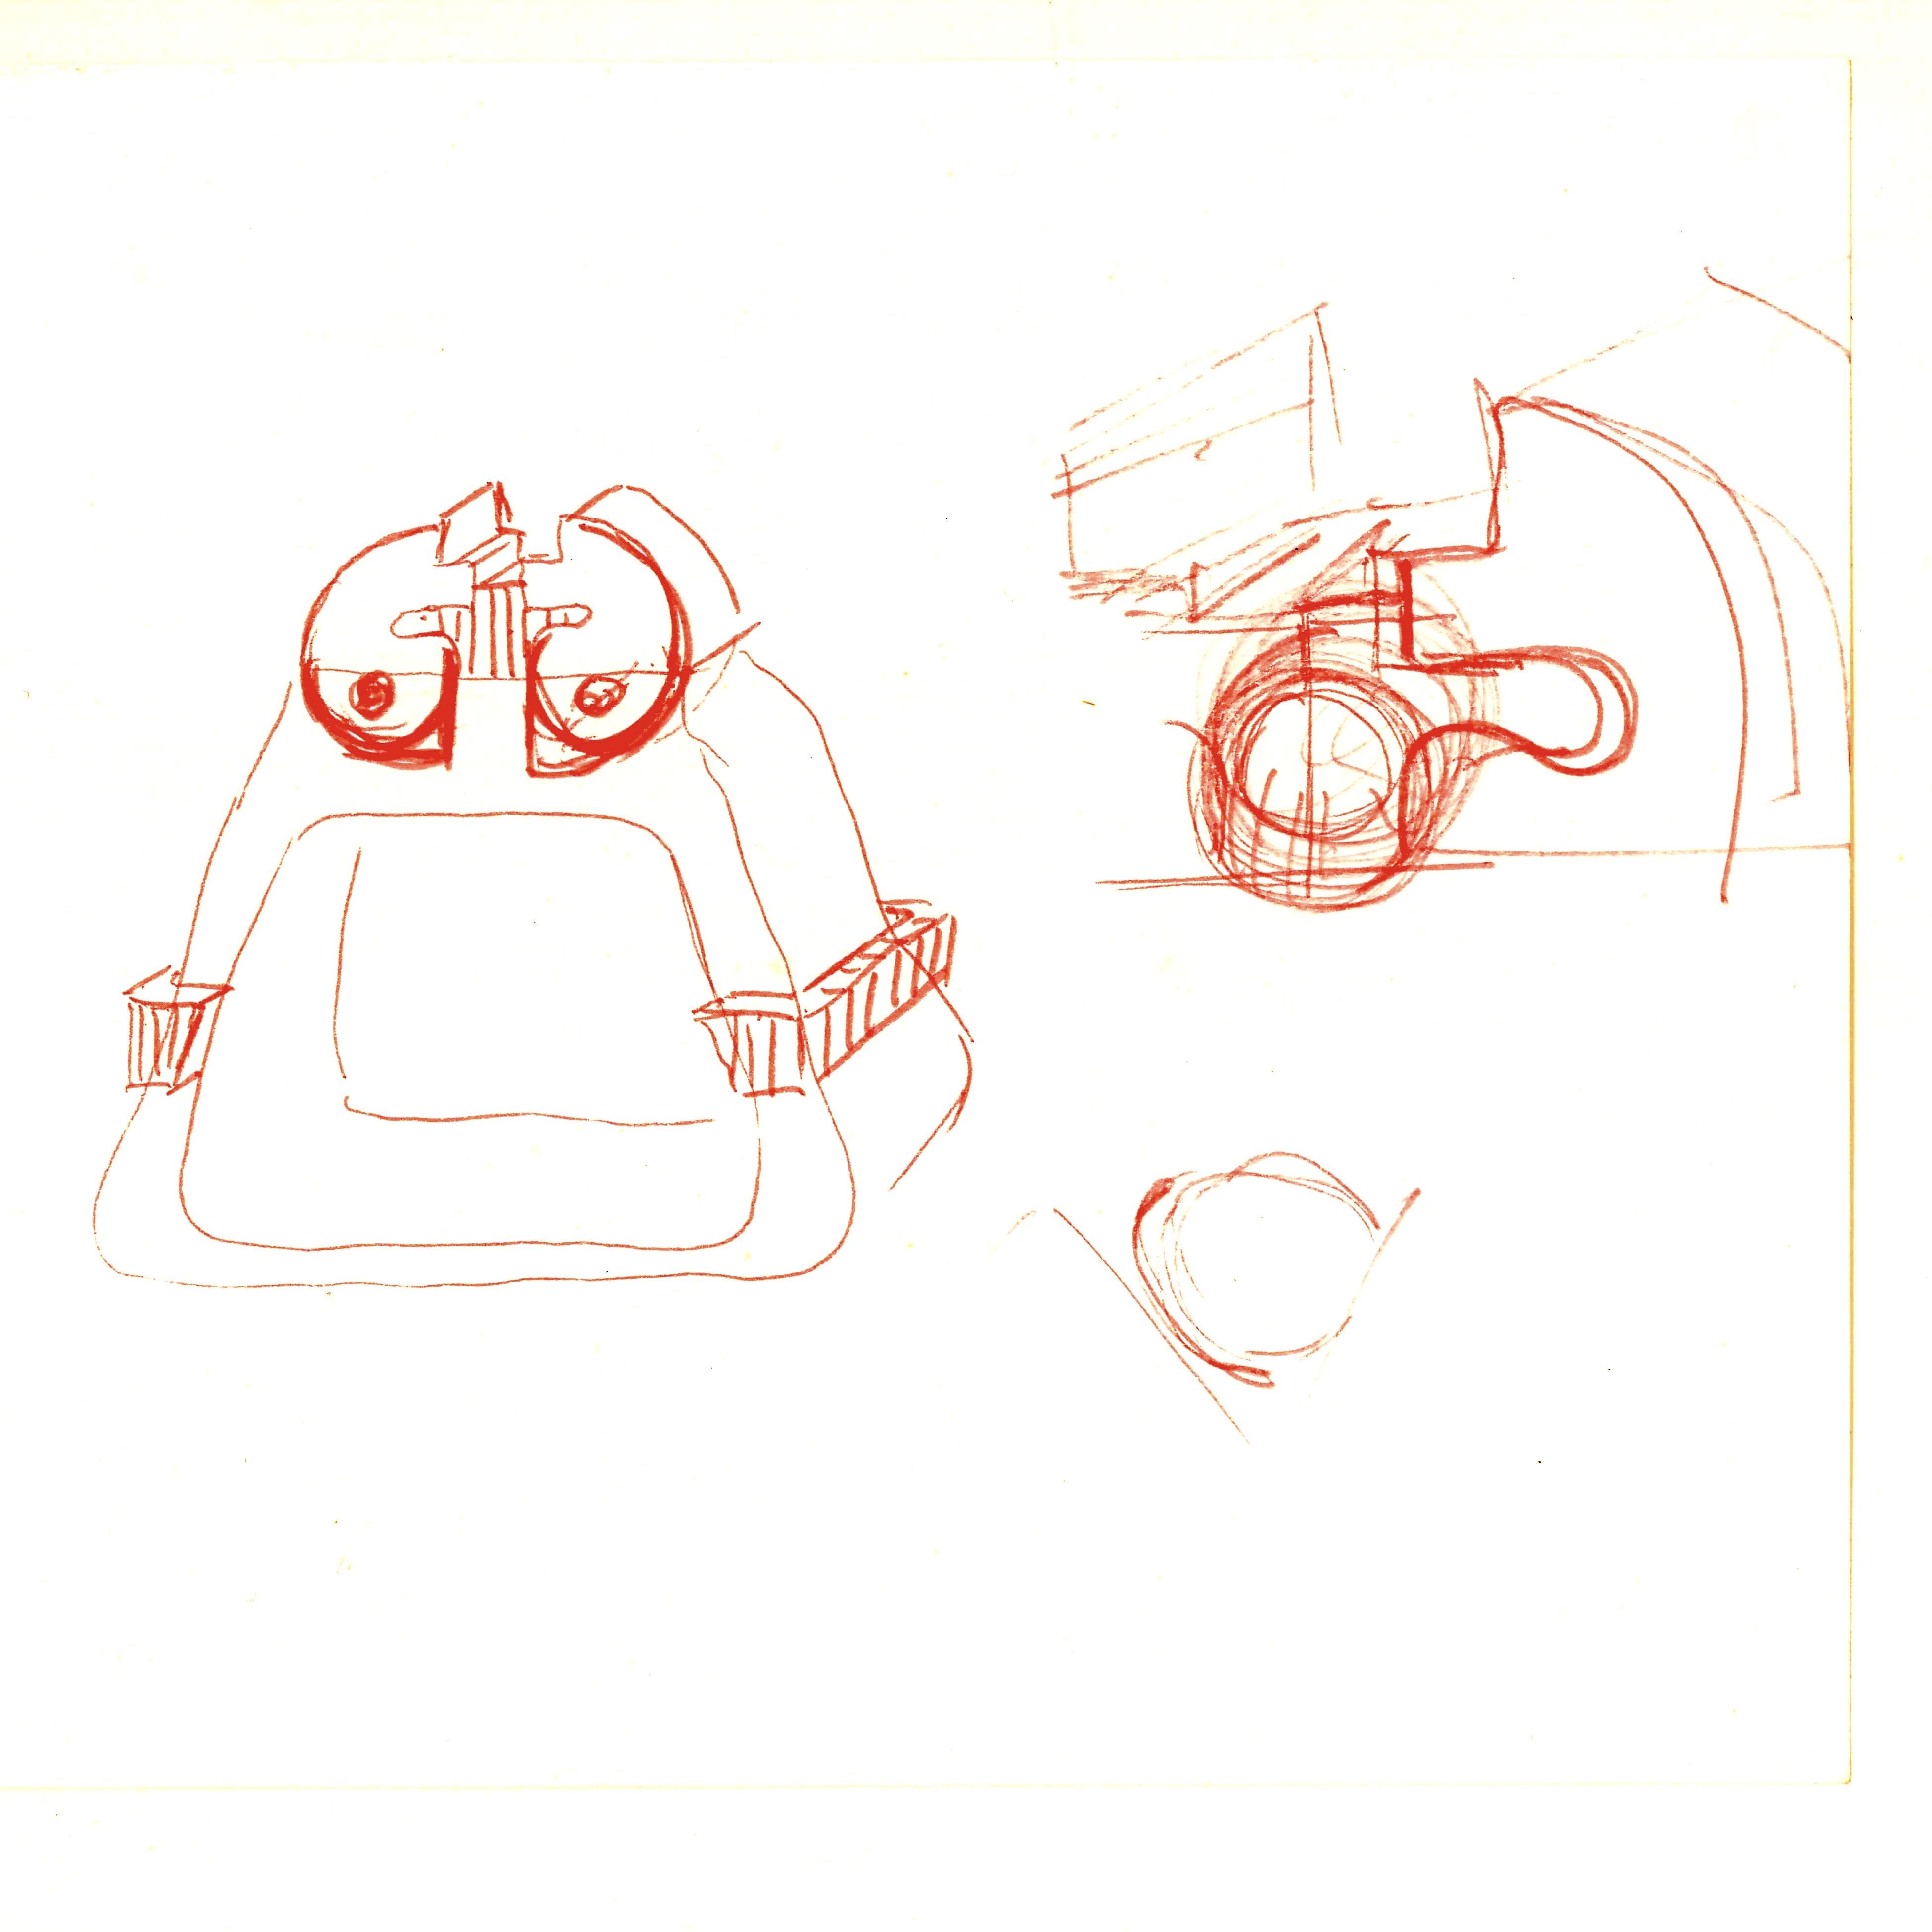 Fritz Maierhofer, tekening ring, 1970. Collectie Boelen